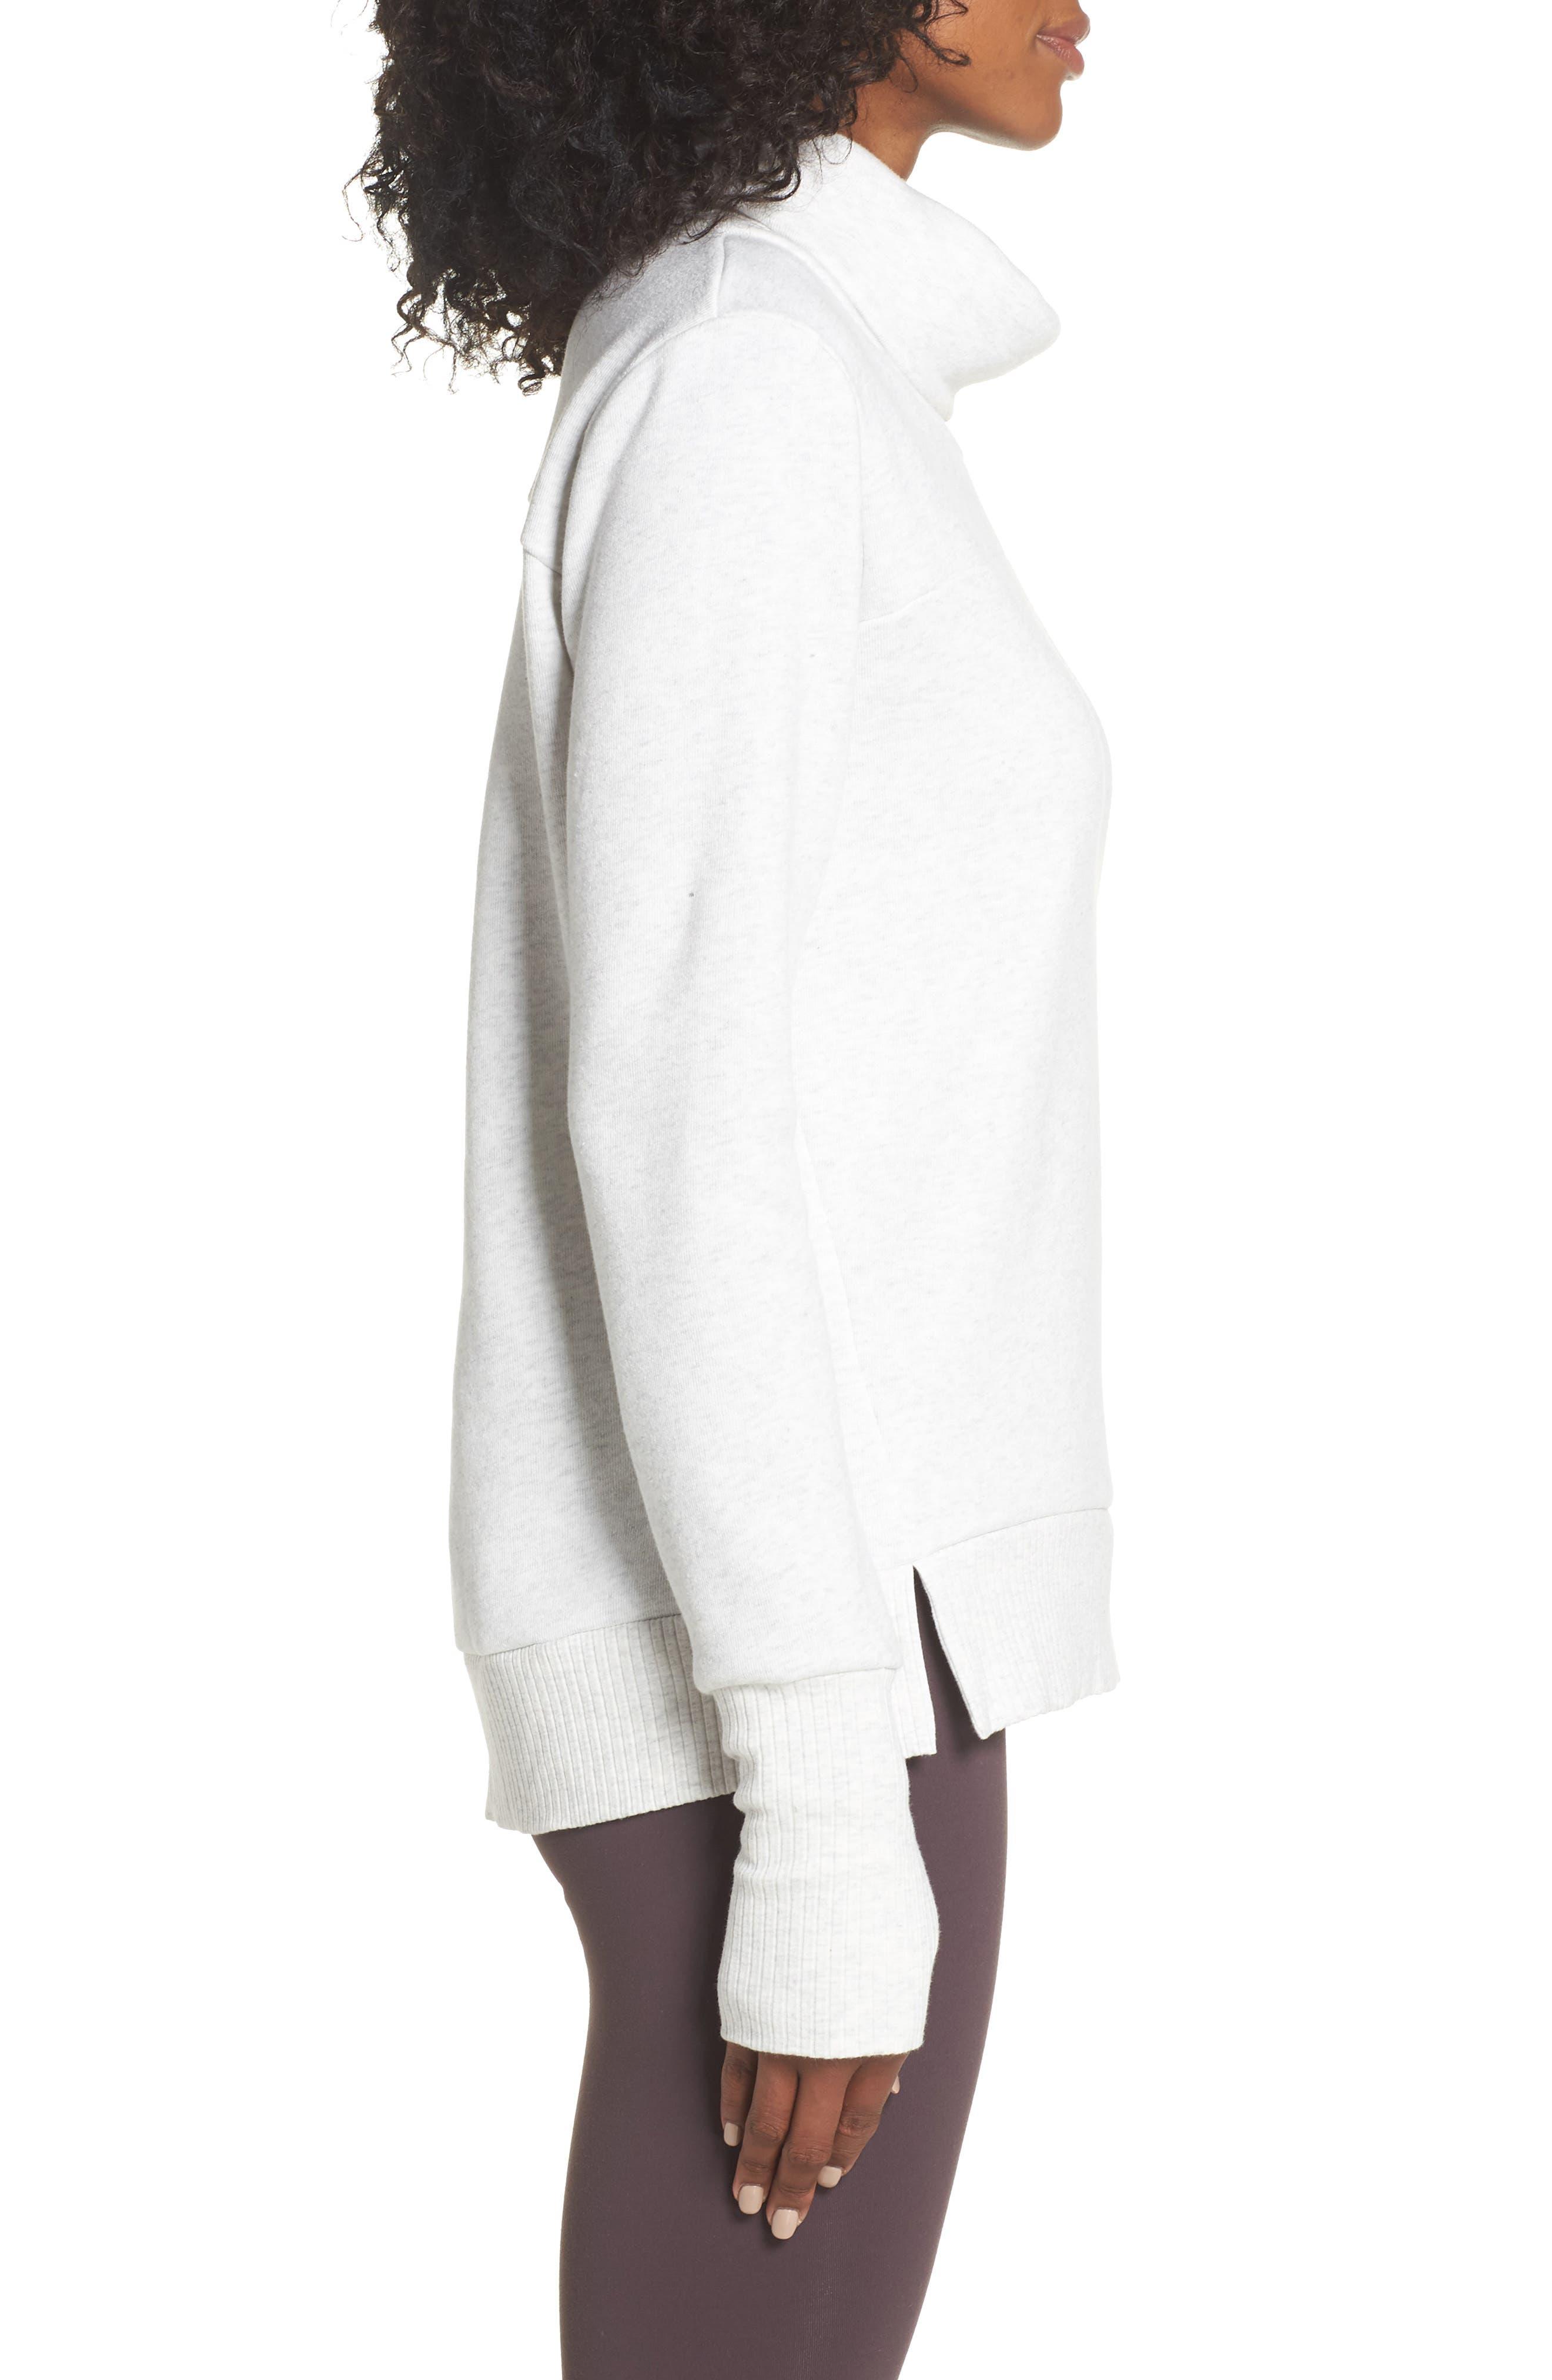 'Haze' Funnel Neck Sweatshirt,                             Alternate thumbnail 3, color,                             WHITE HEATHER